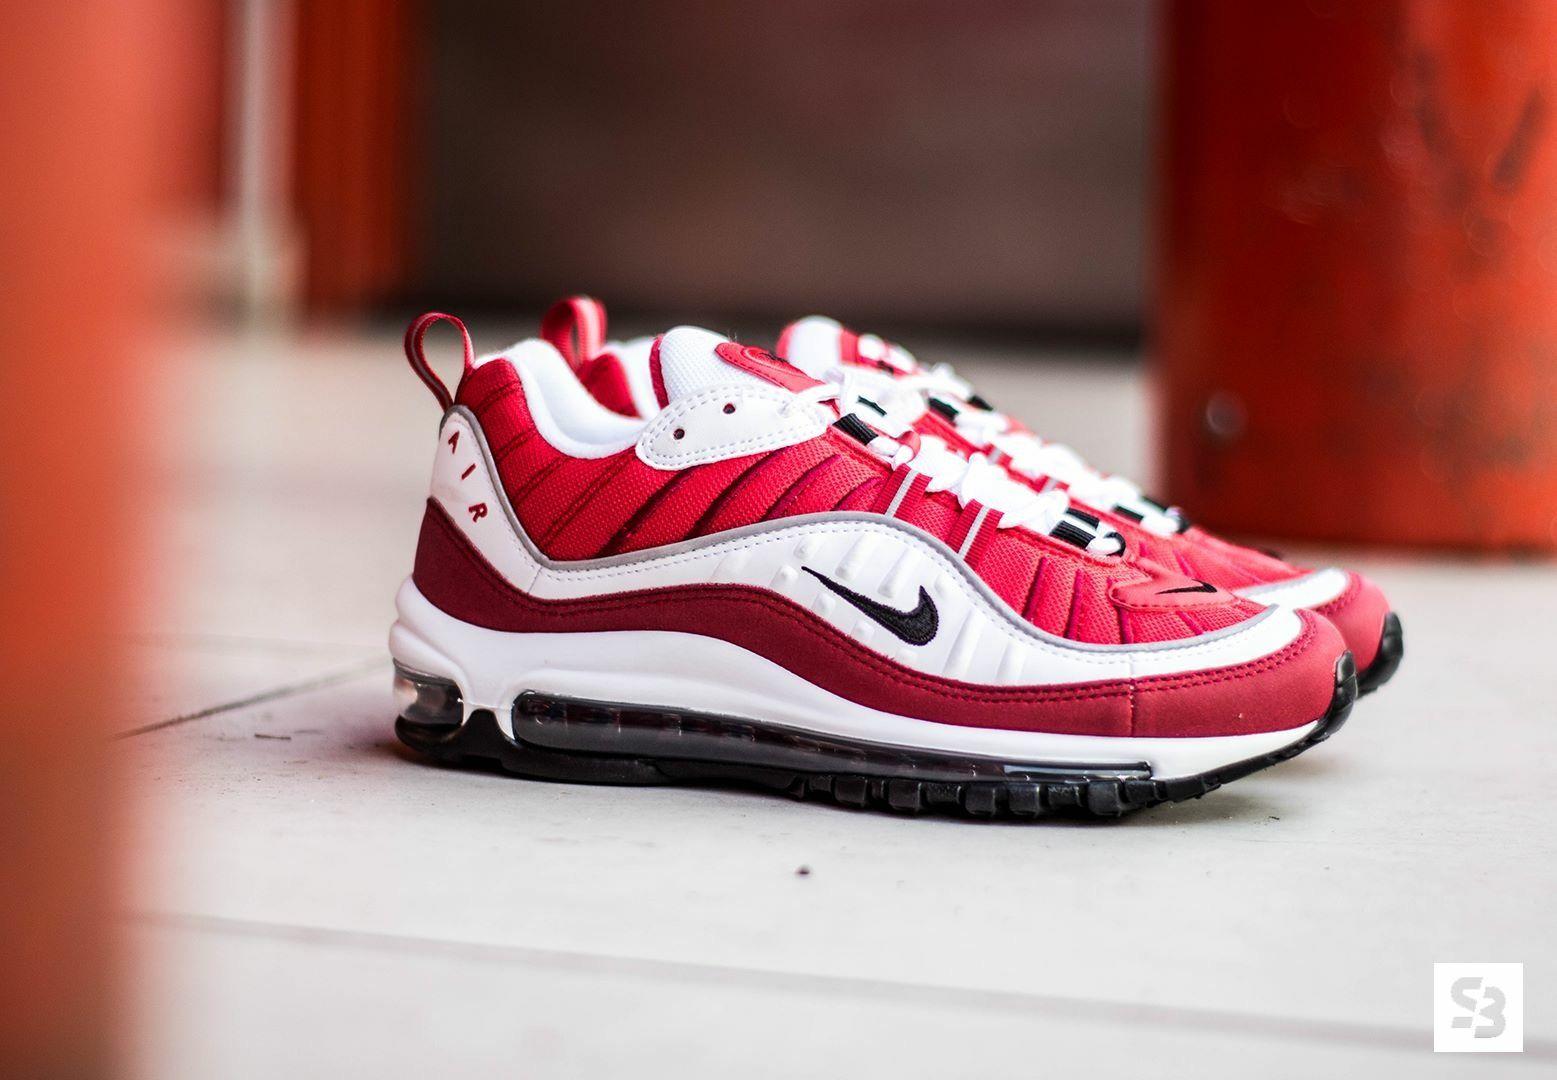 Nike Air Max 1 Mars Stone Sneaker Pickup & Unboxing | Nike